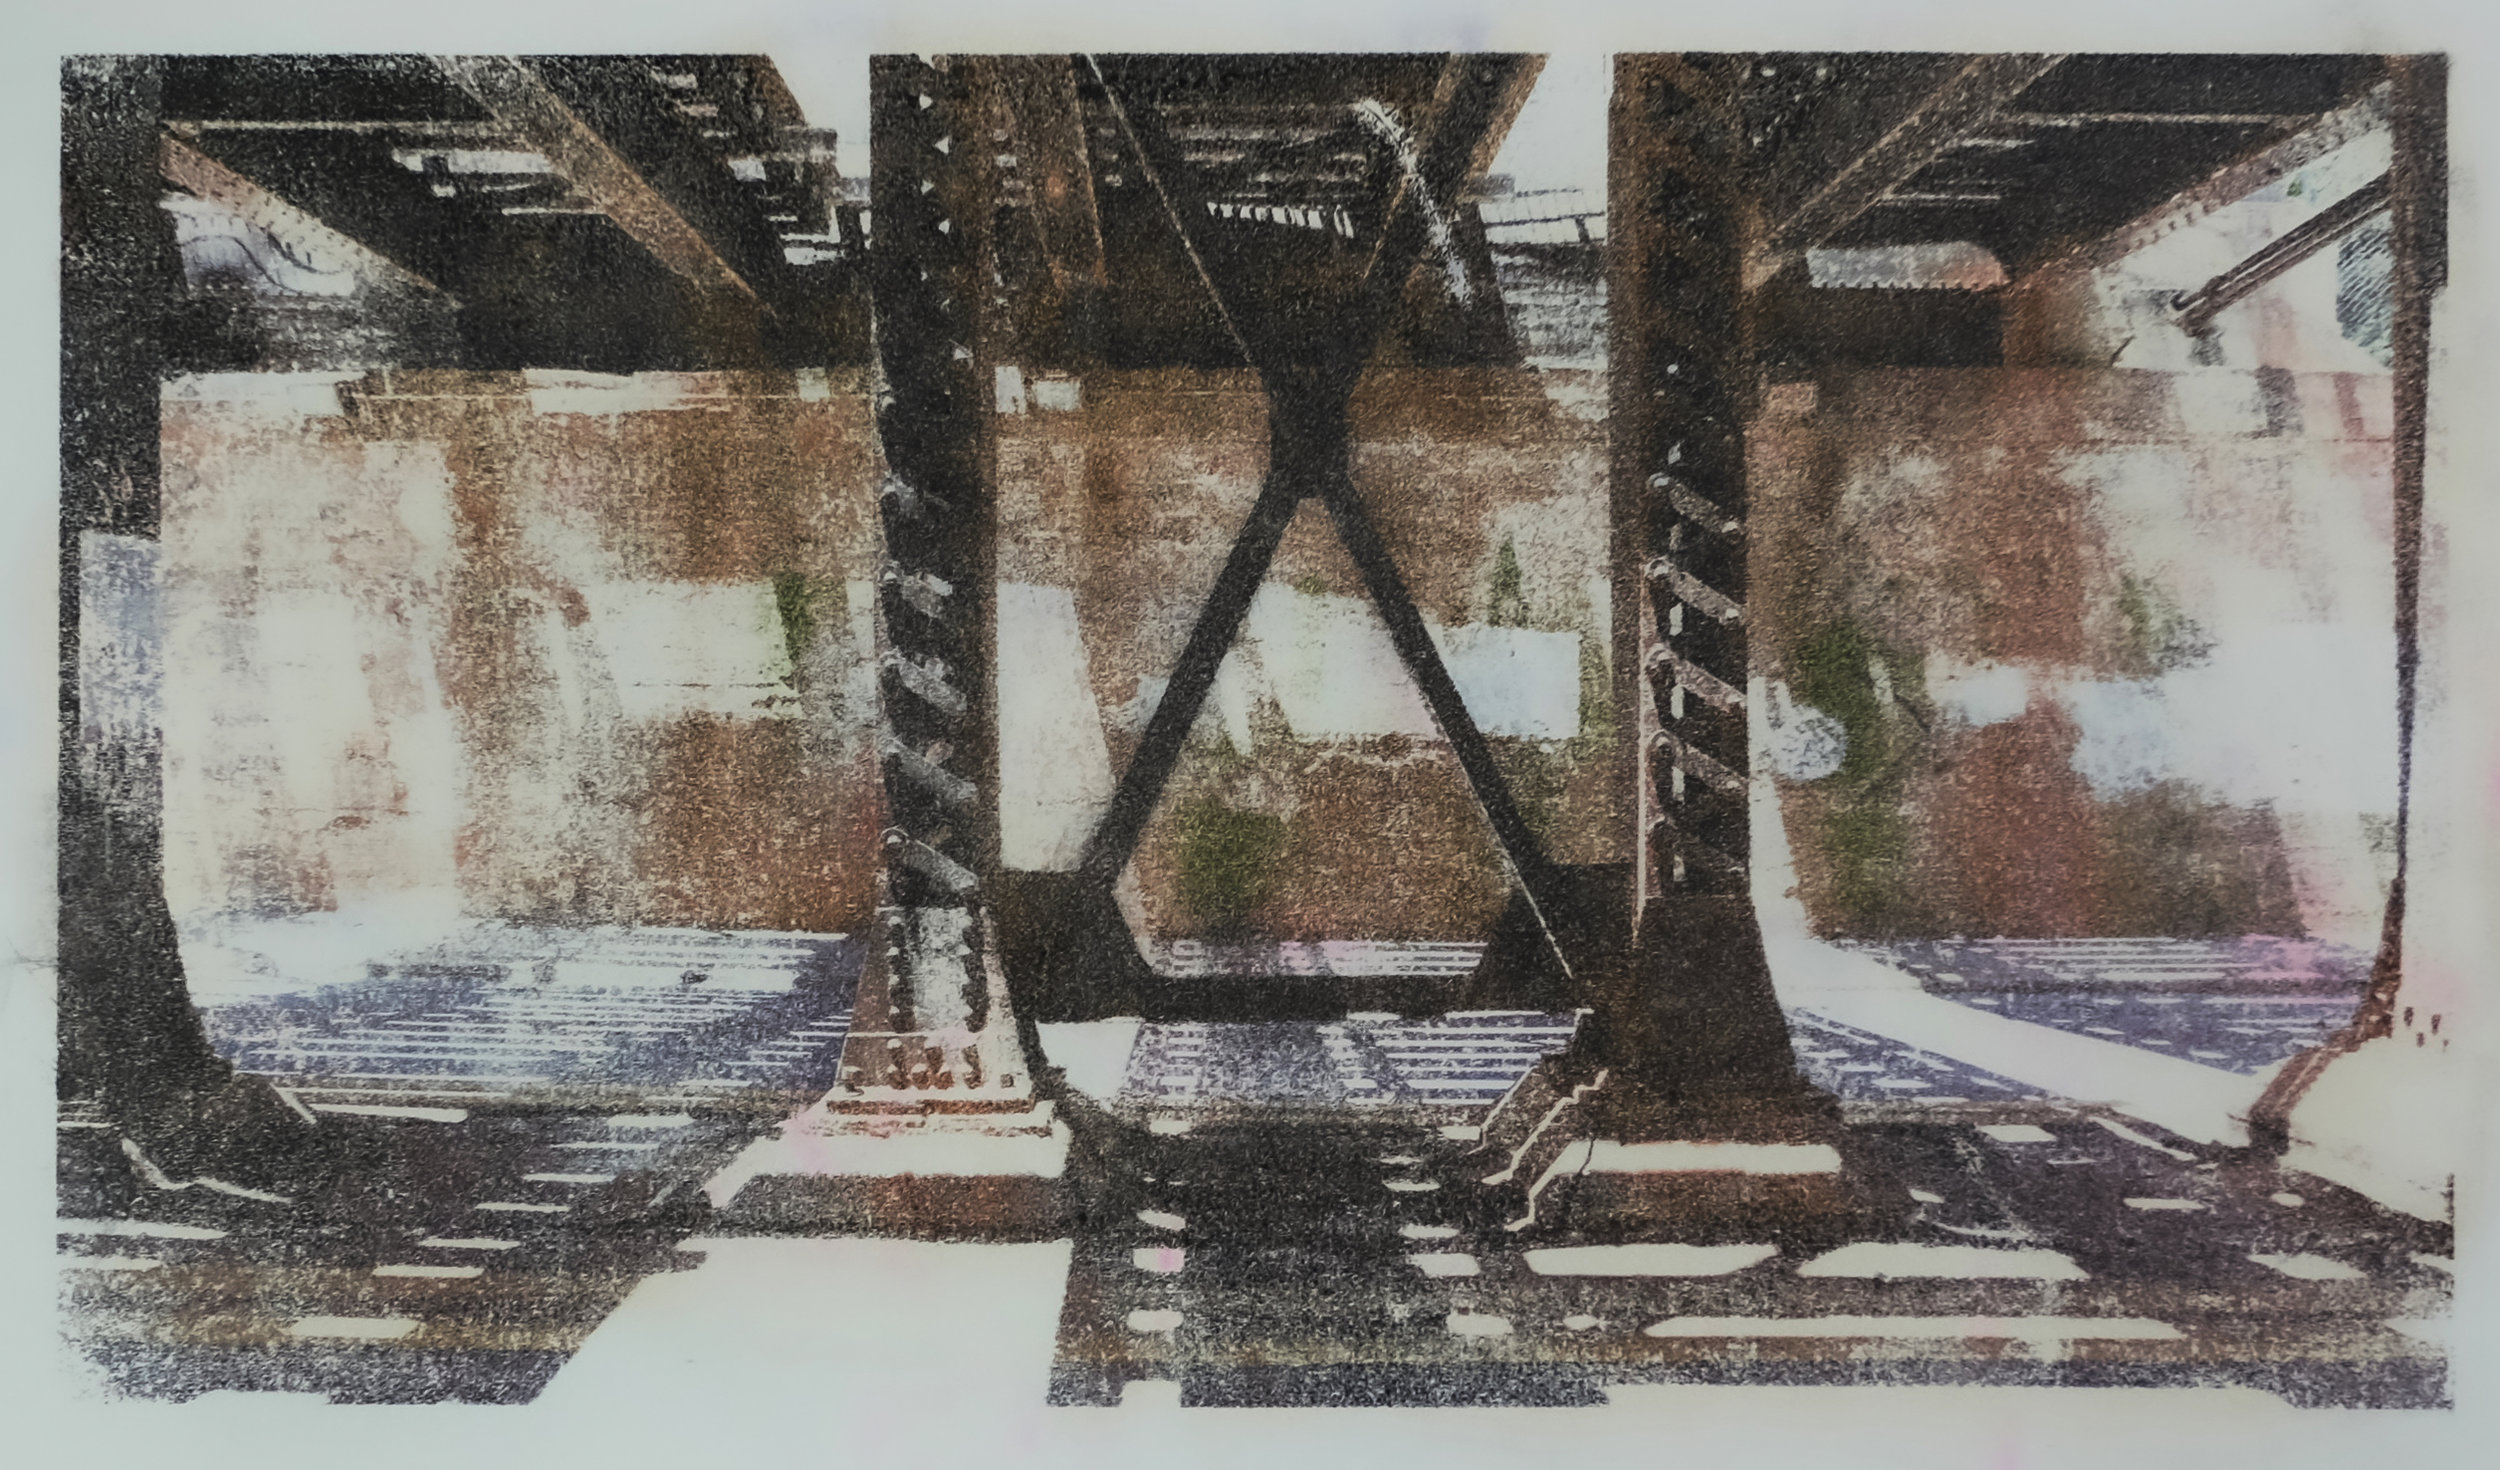 X Bridge, Greensboro (2016)